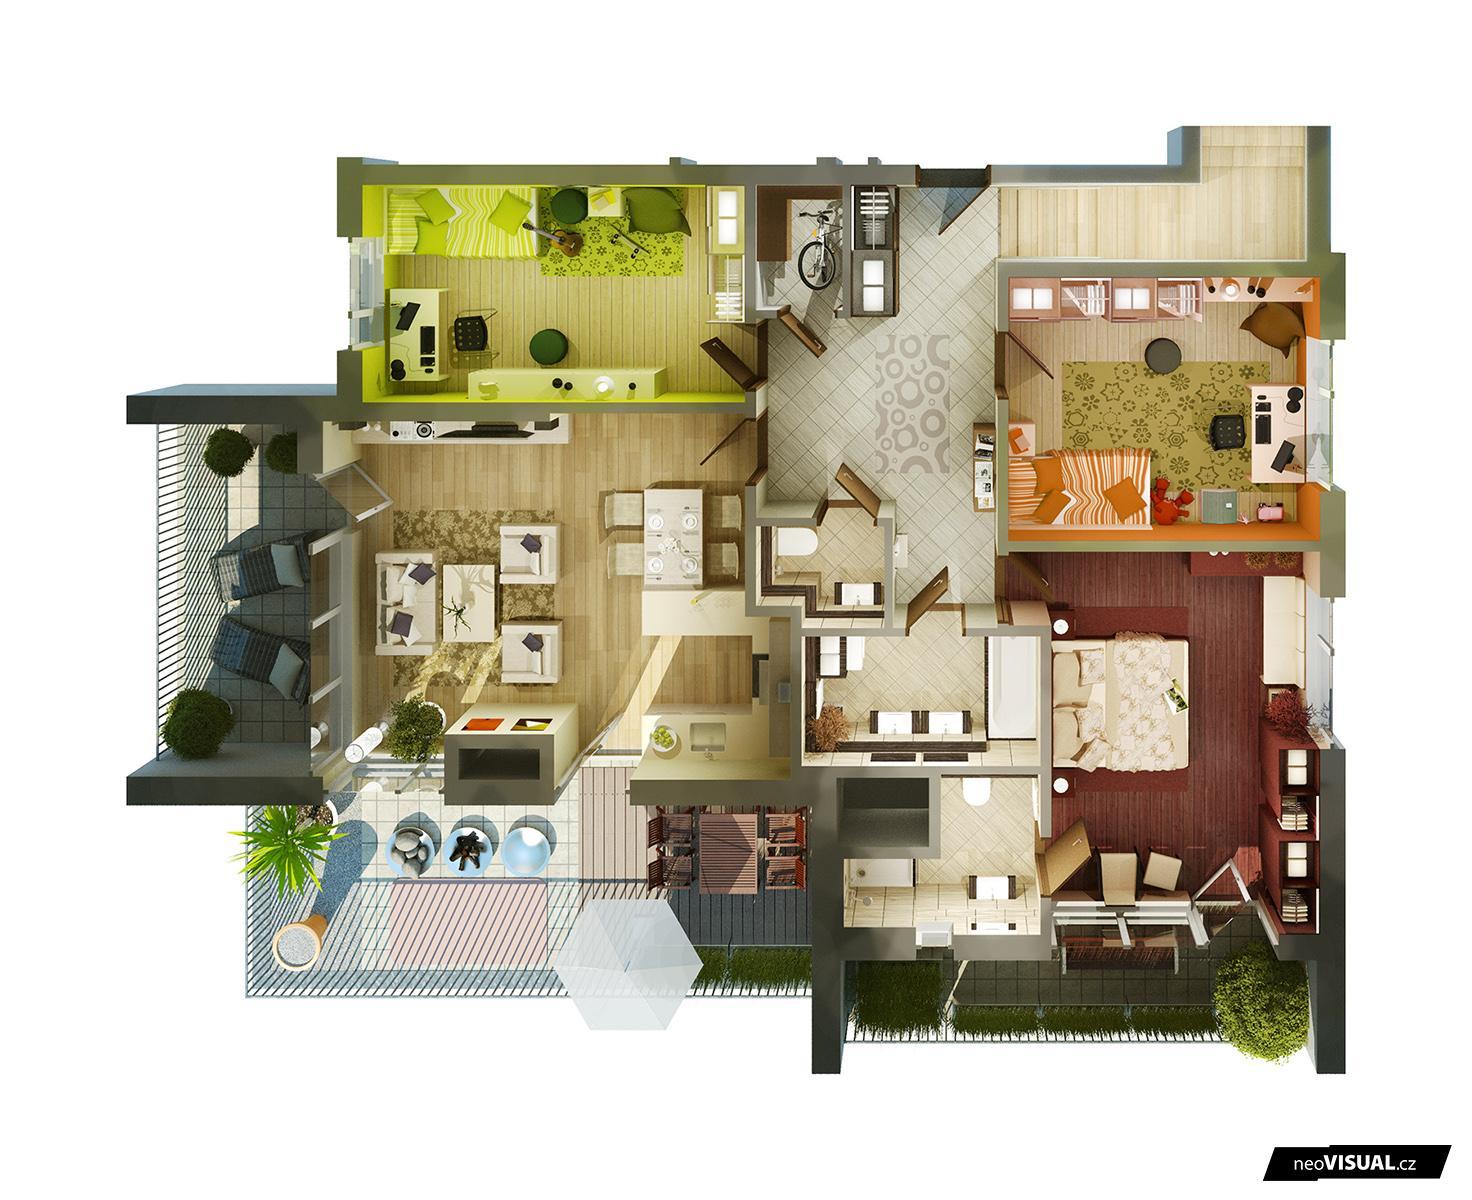 Grundriss villa 3d  neoVISUAL | 3D půdorysy